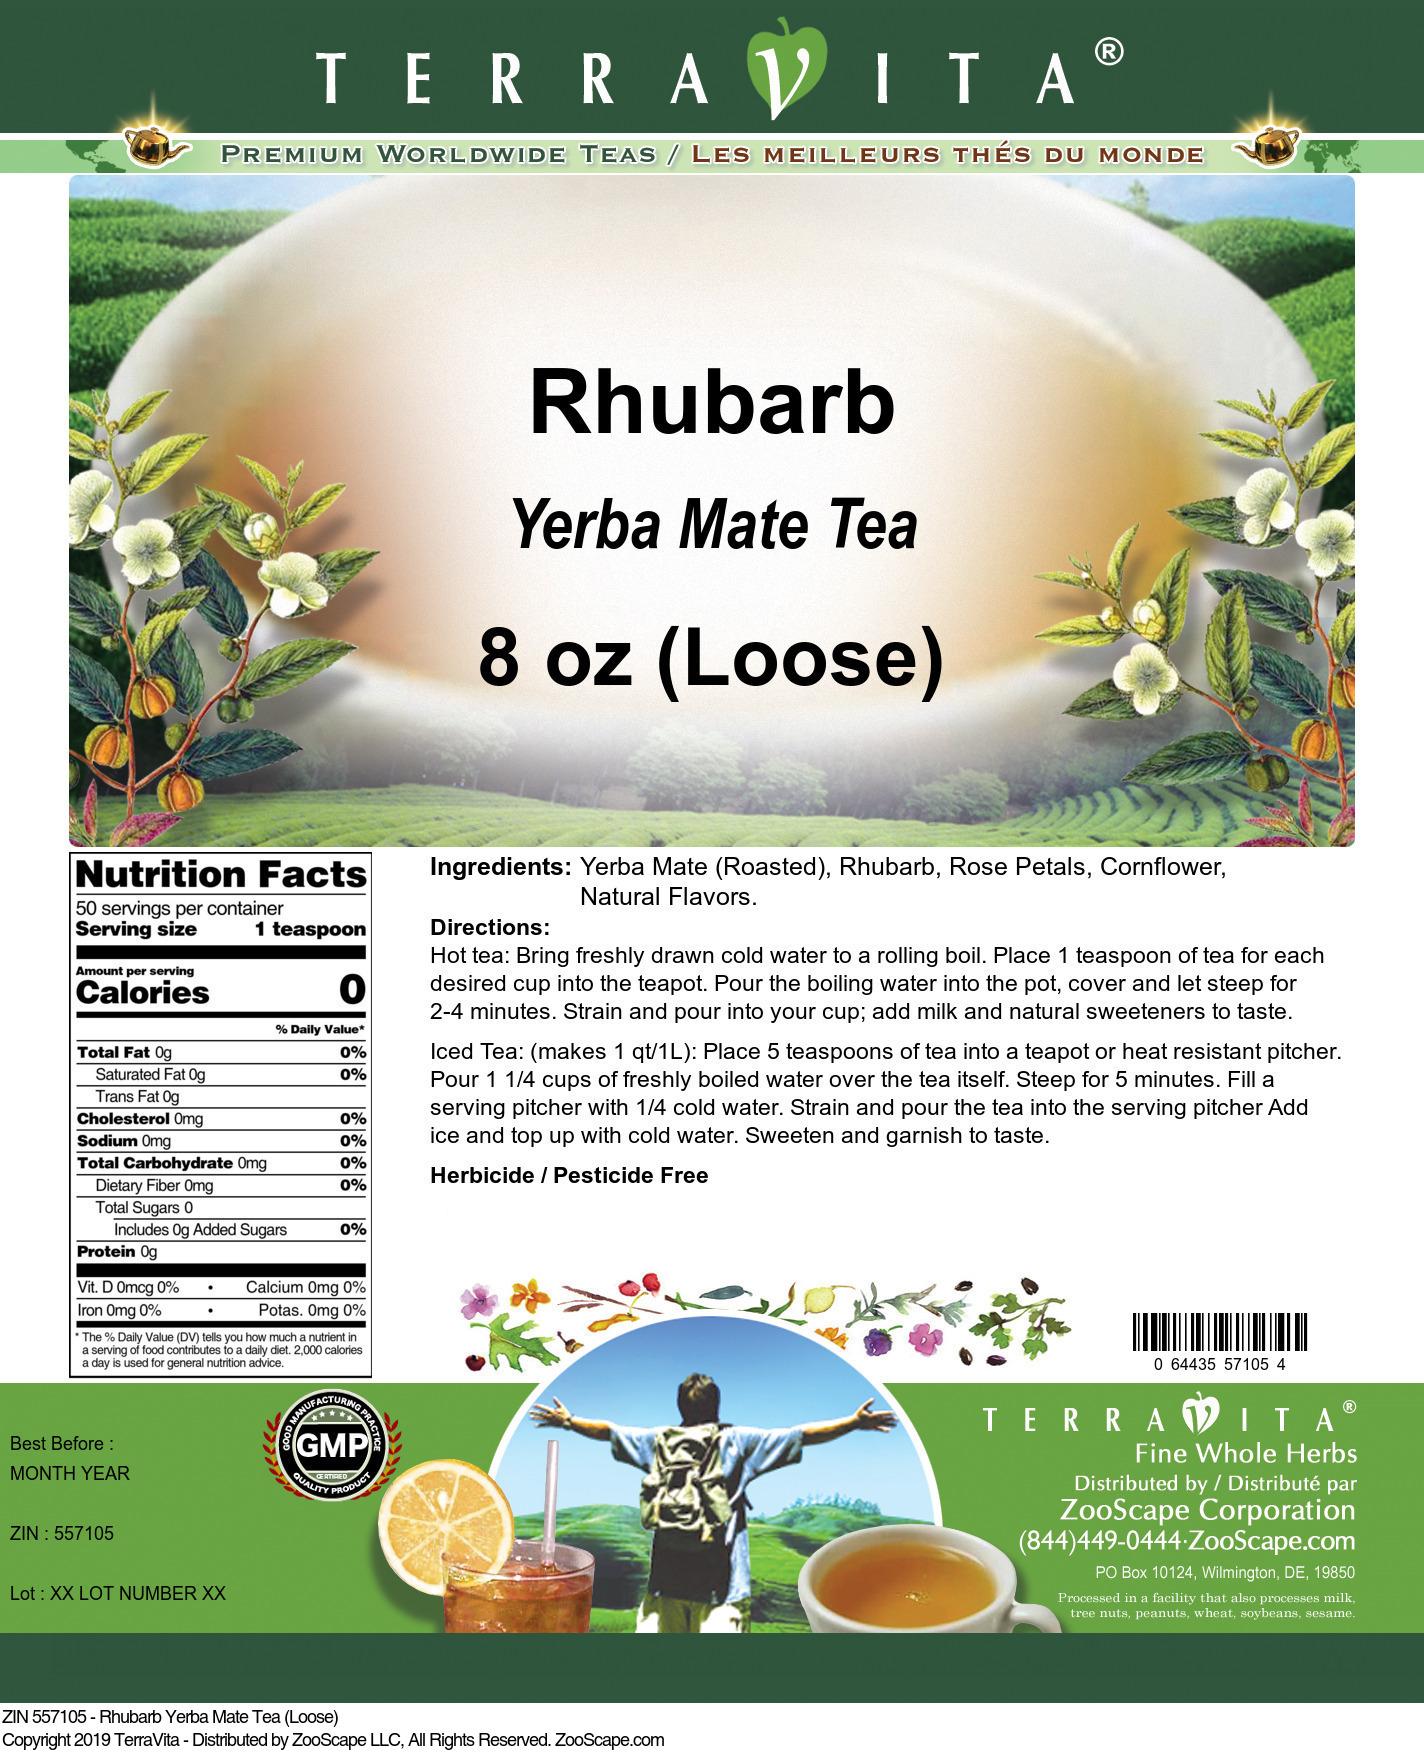 Rhubarb Yerba Mate